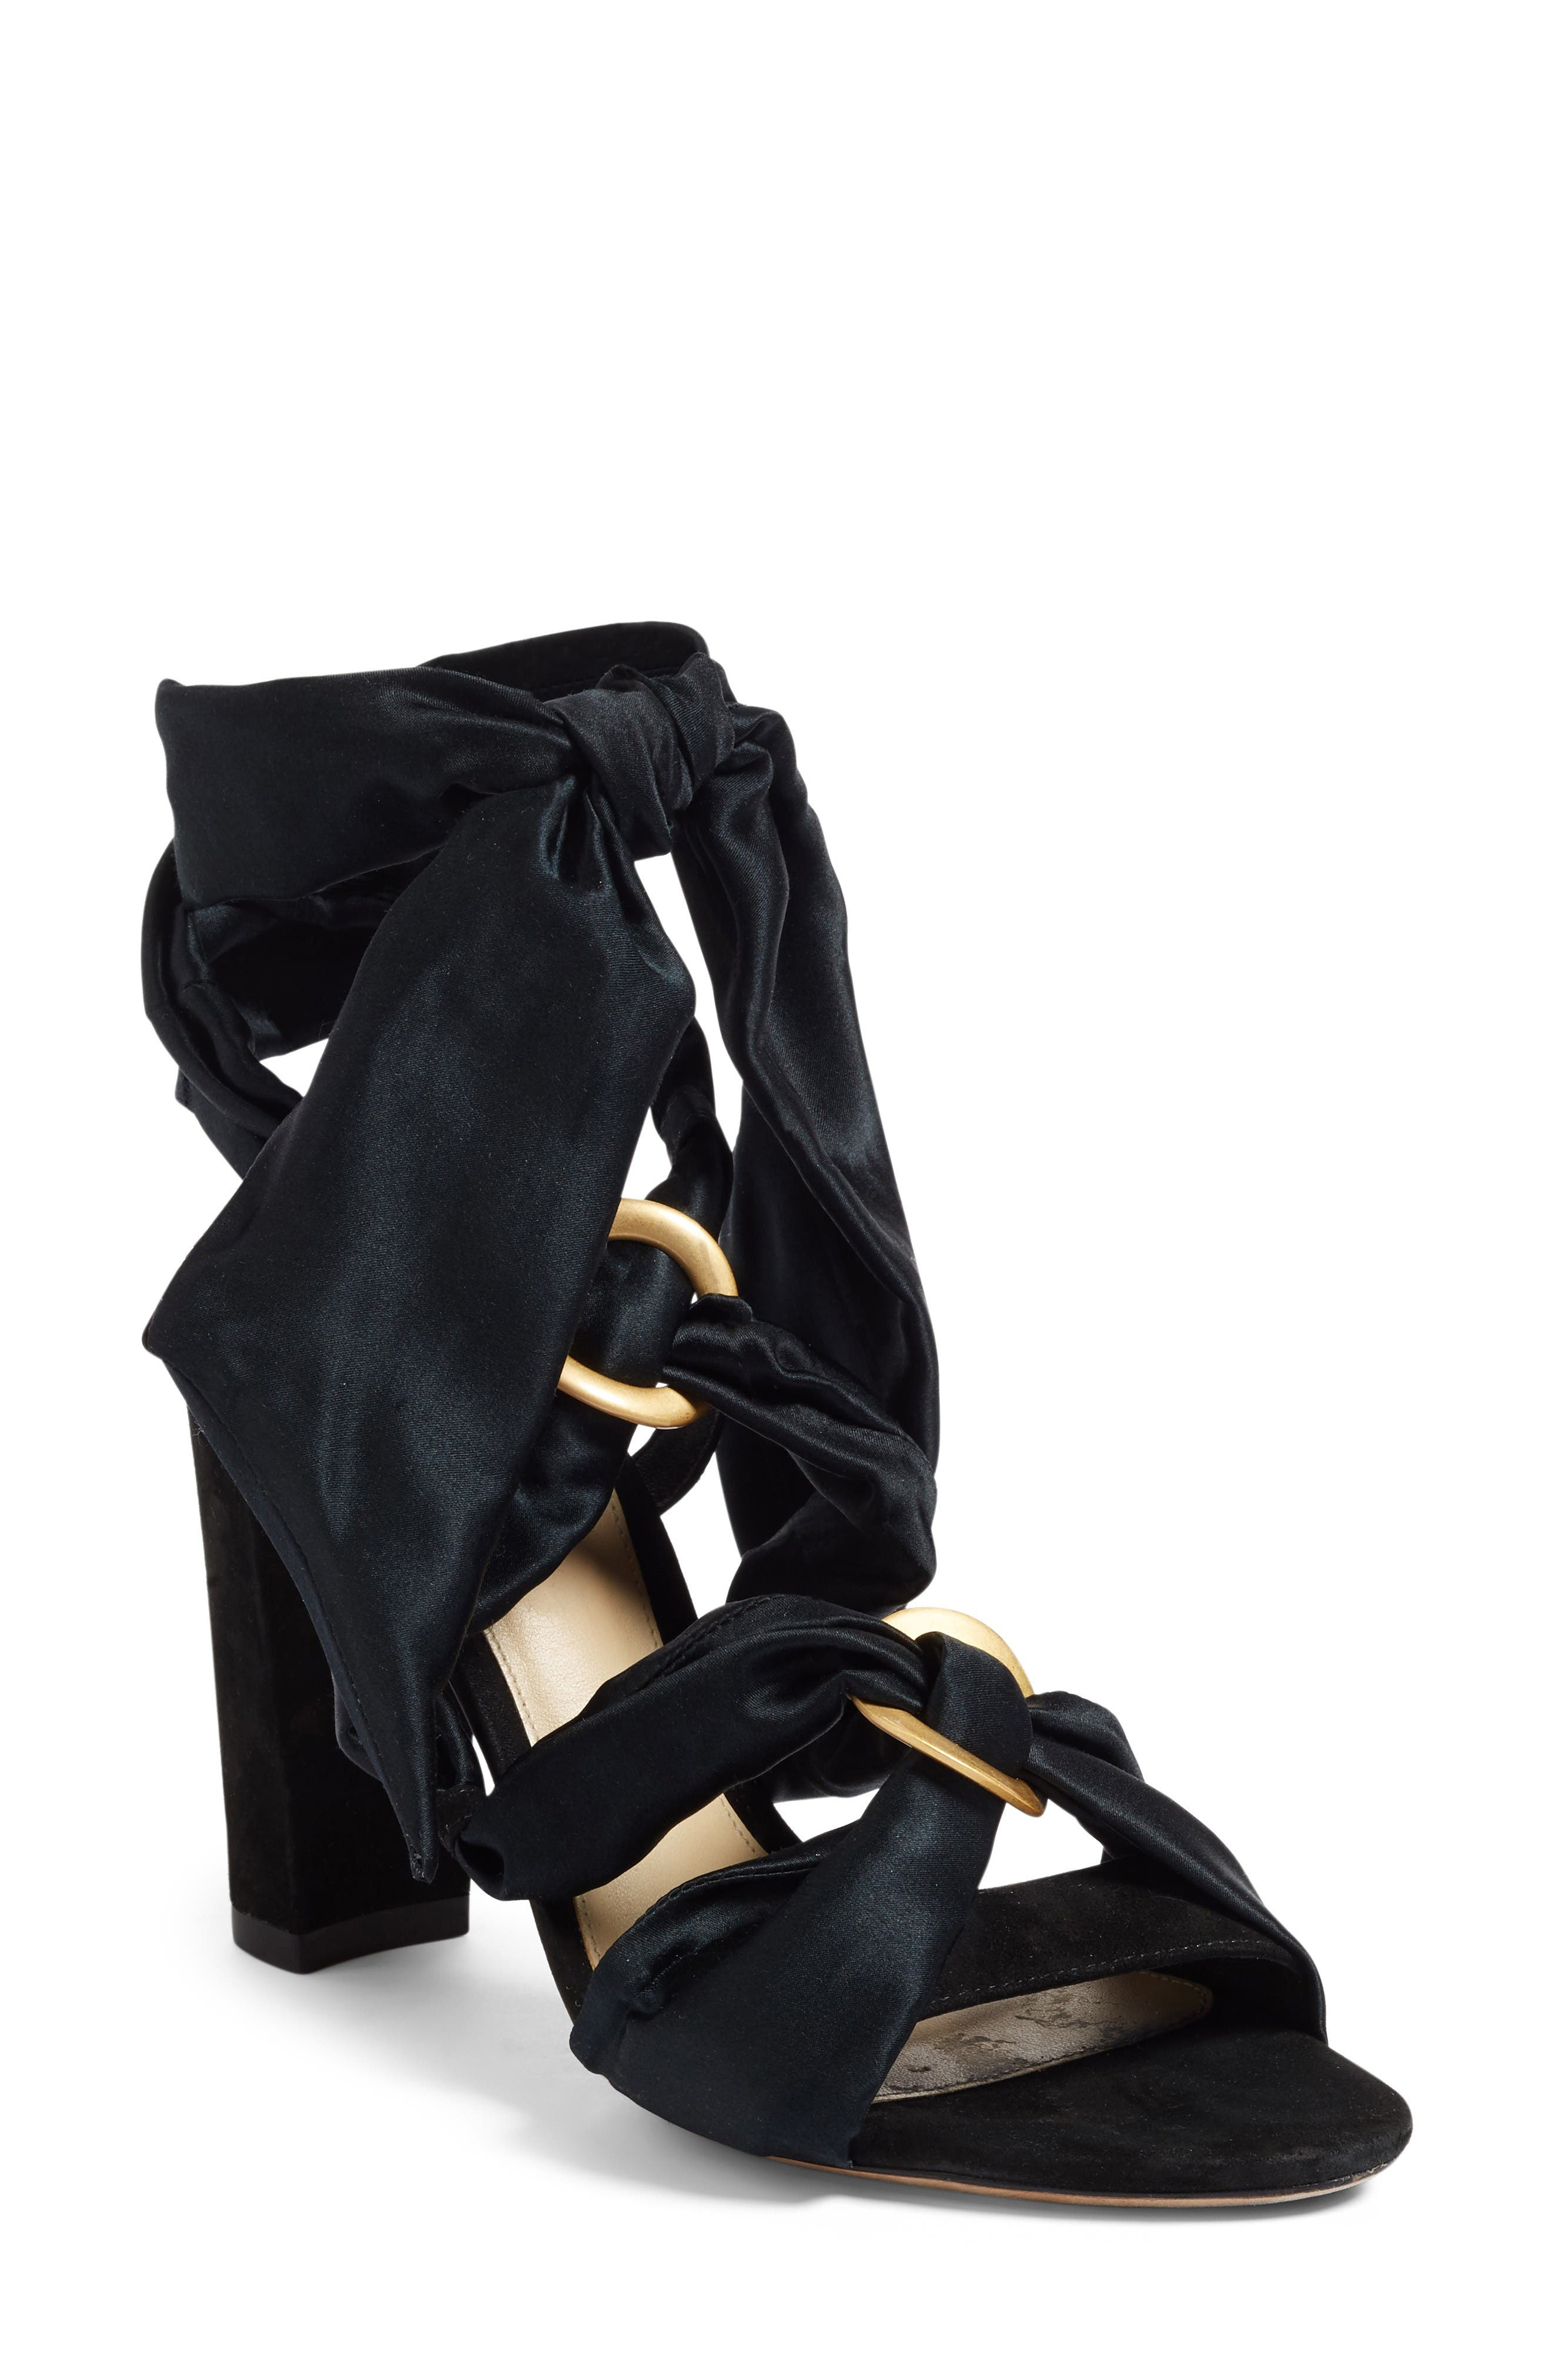 ALEXANDRE BIRMAN Alessa Block Heel Sandal